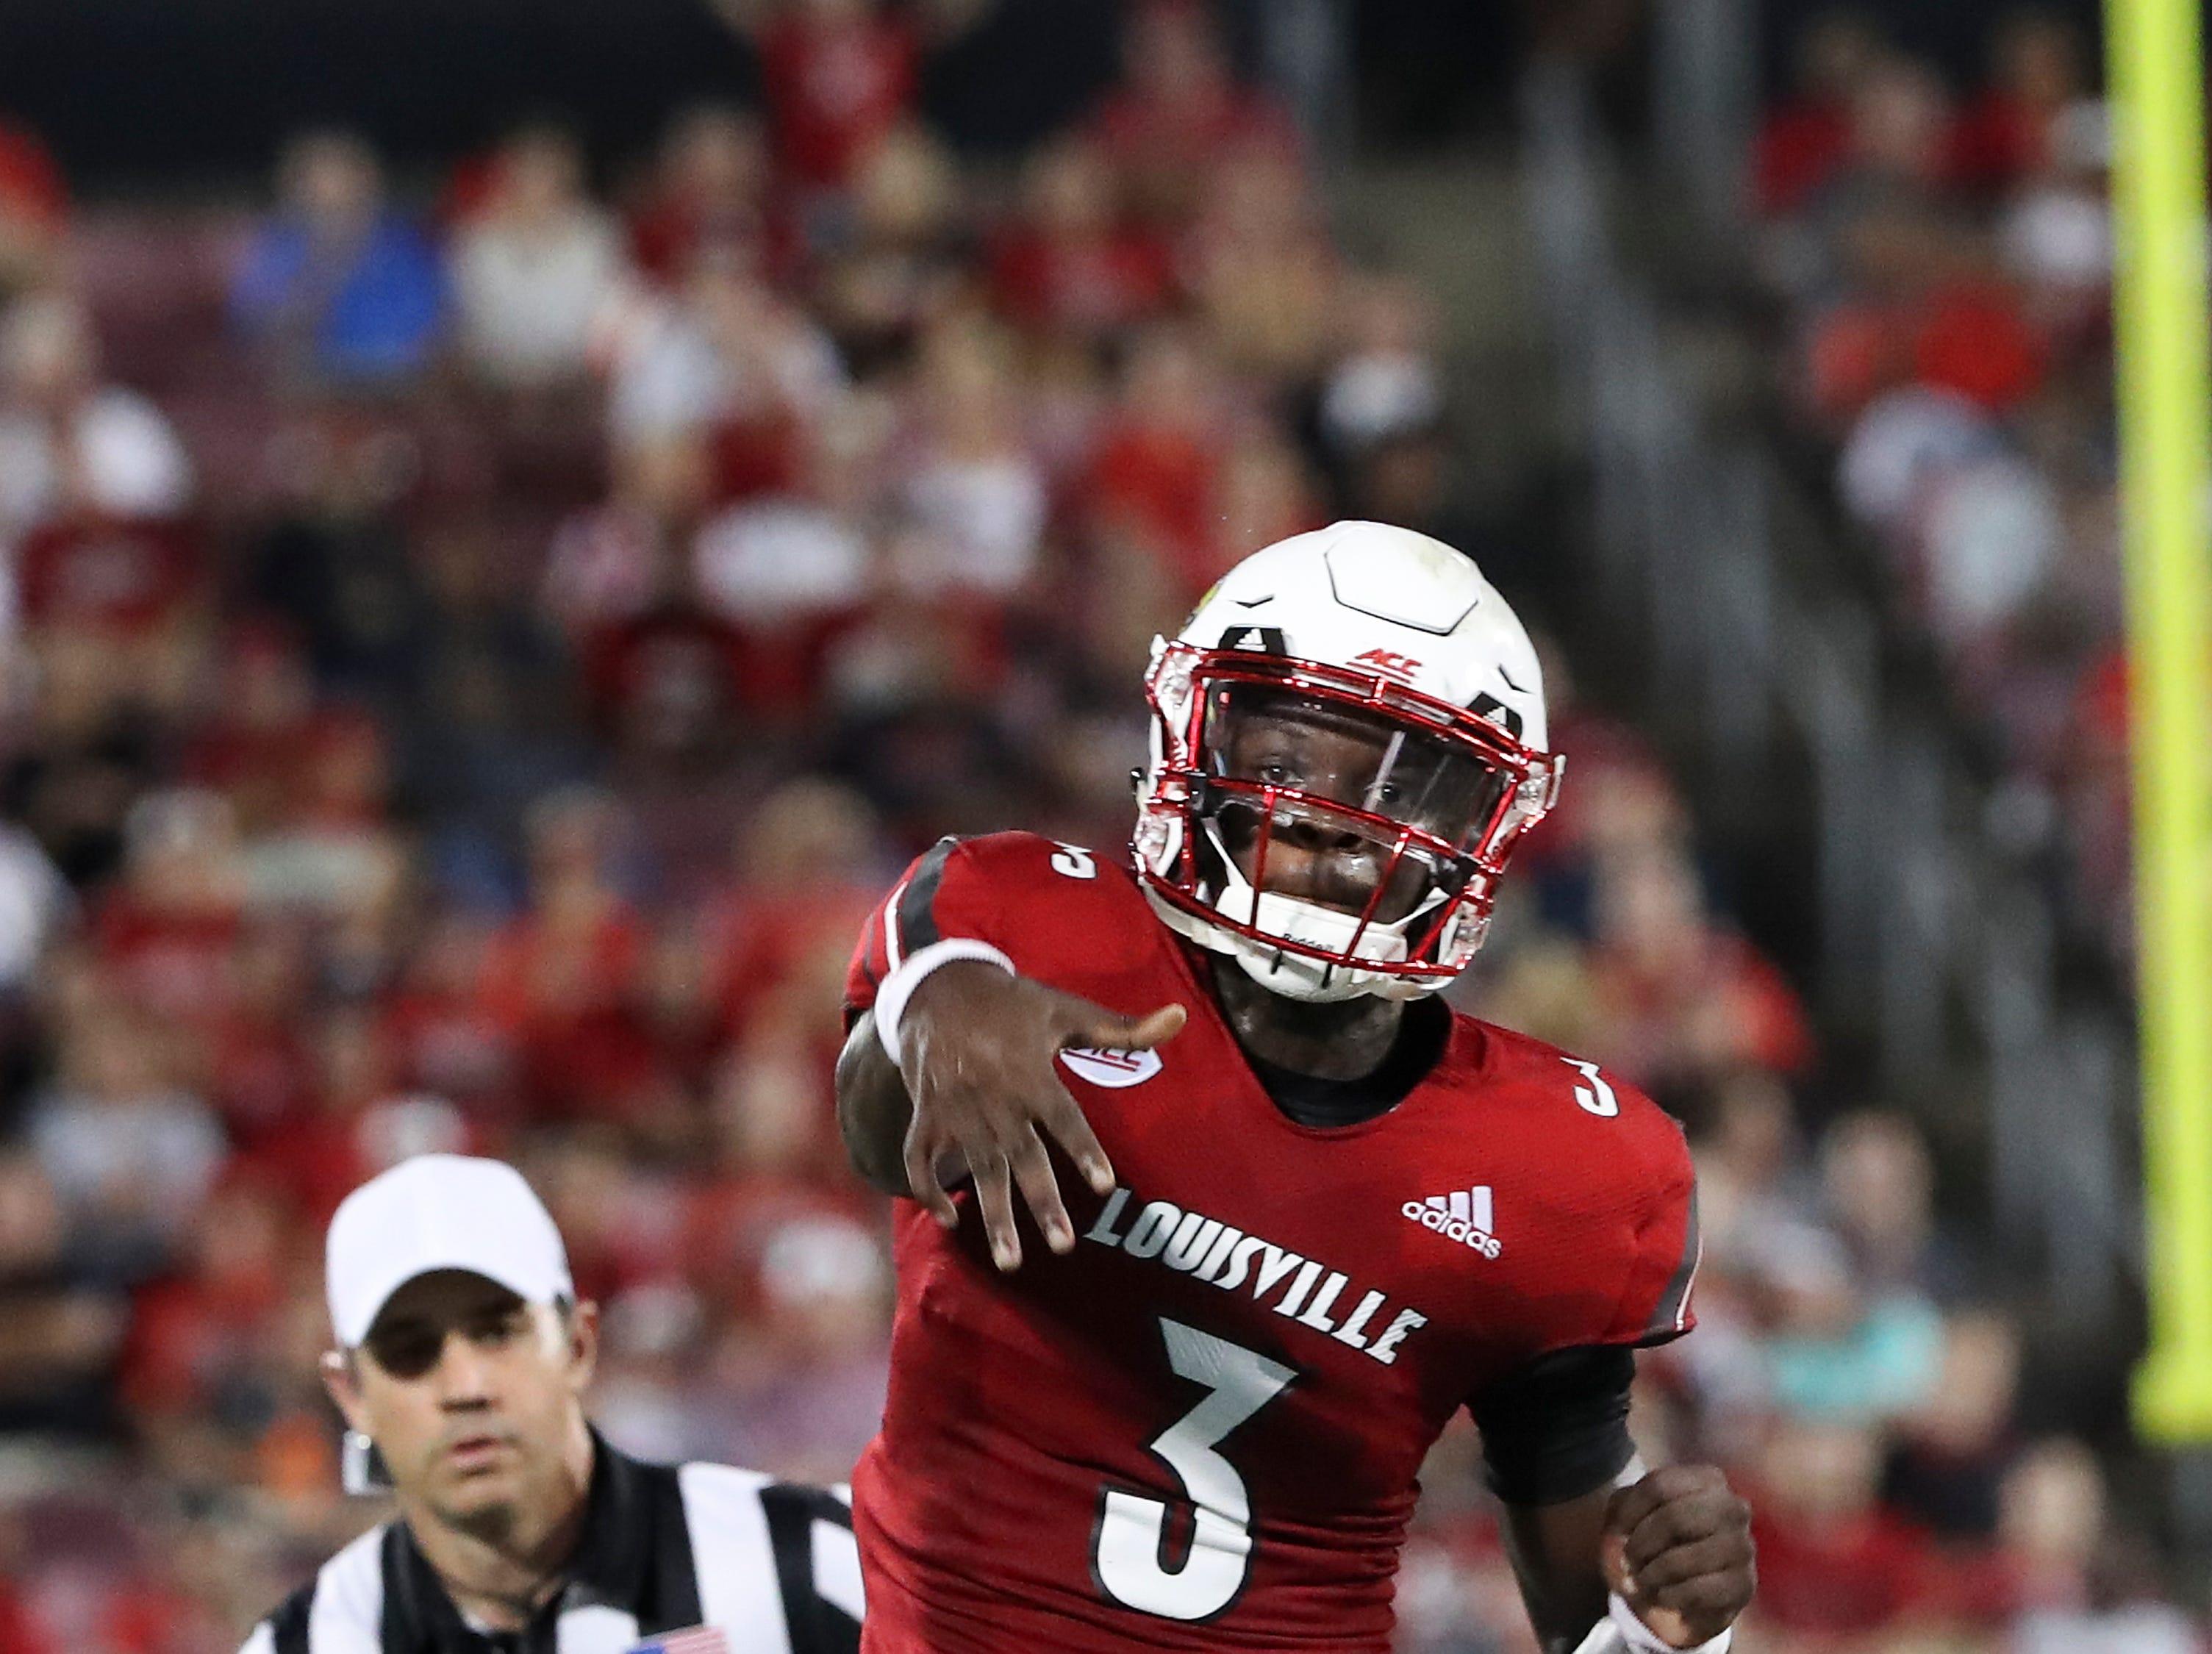 Louisville QB Malik Cunningham (3) passes against WKU during their game at Cardinal Stadium.Sep. 15, 2018